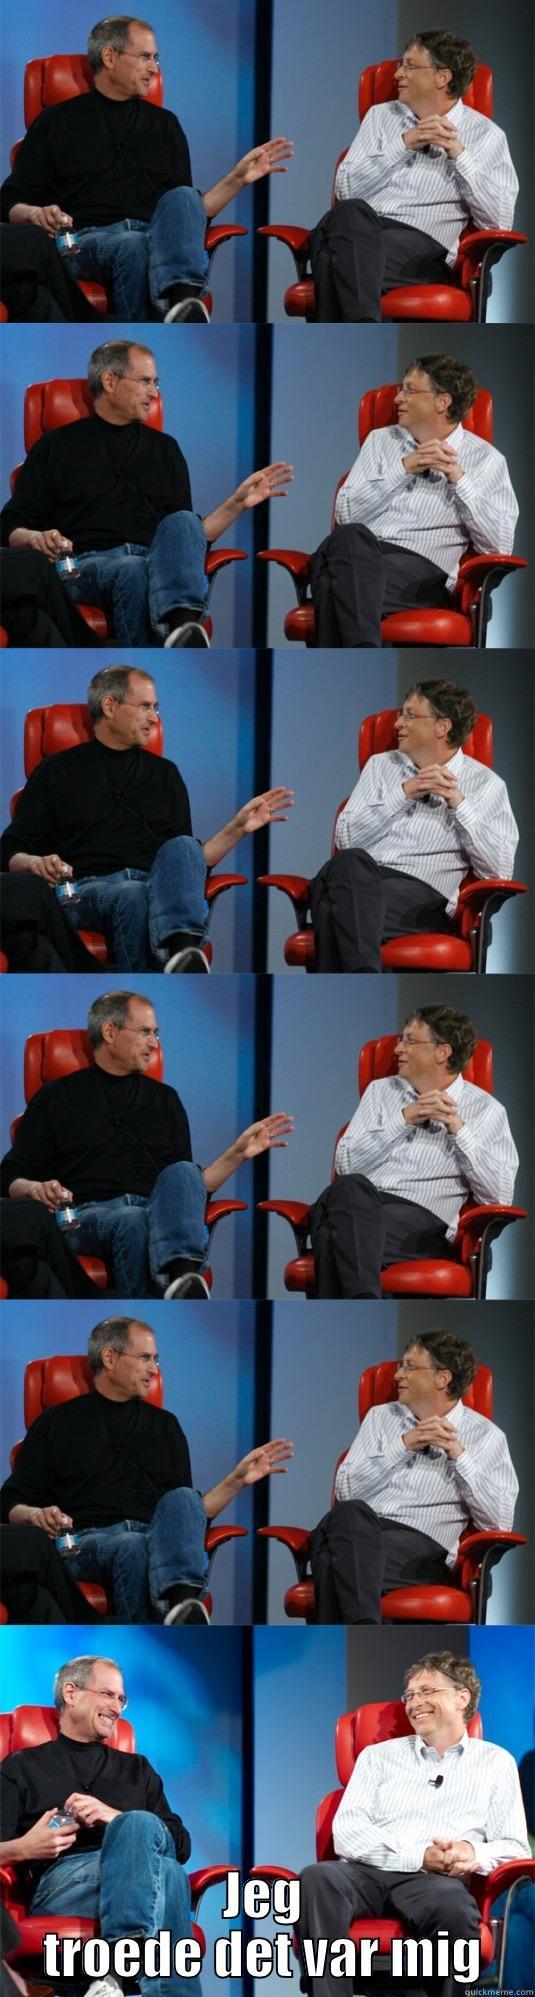 JEG TROEDE DET VAR MIG Steve Jobs vs Bill Gates